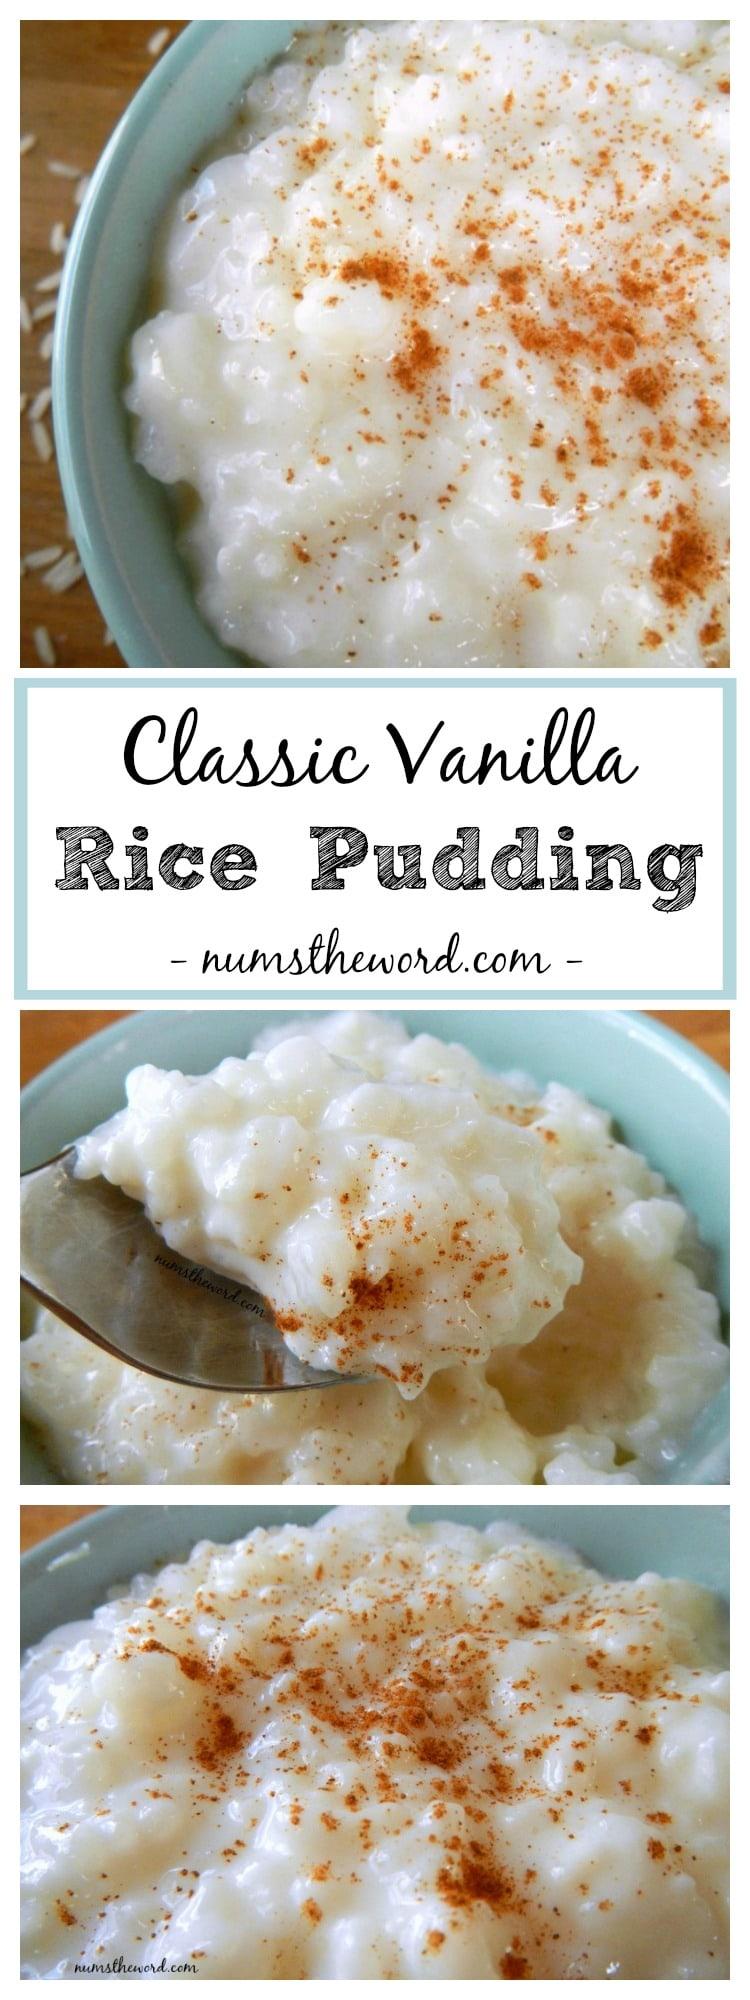 Classic Vanilla Rice Pudding